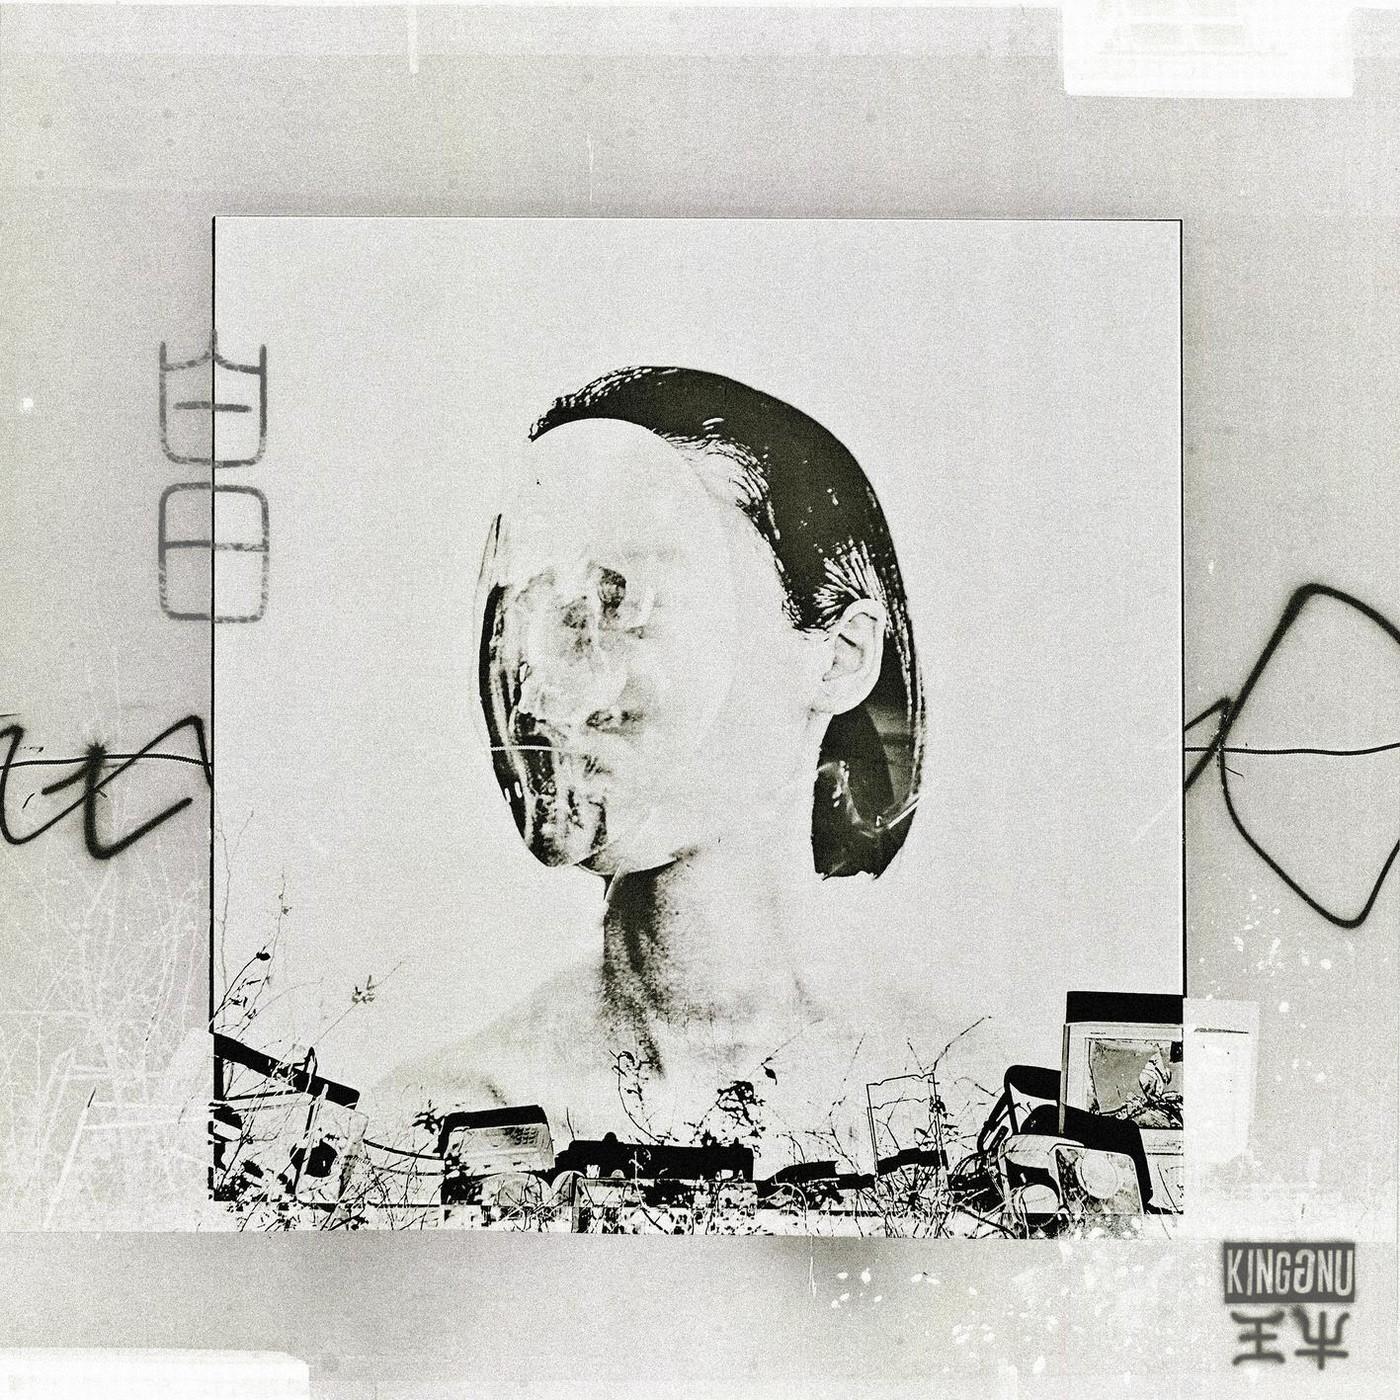 King Gnu – 白日[FLAC + MP3 320 / WEB] [2019 02 22 – J-pop Music Download